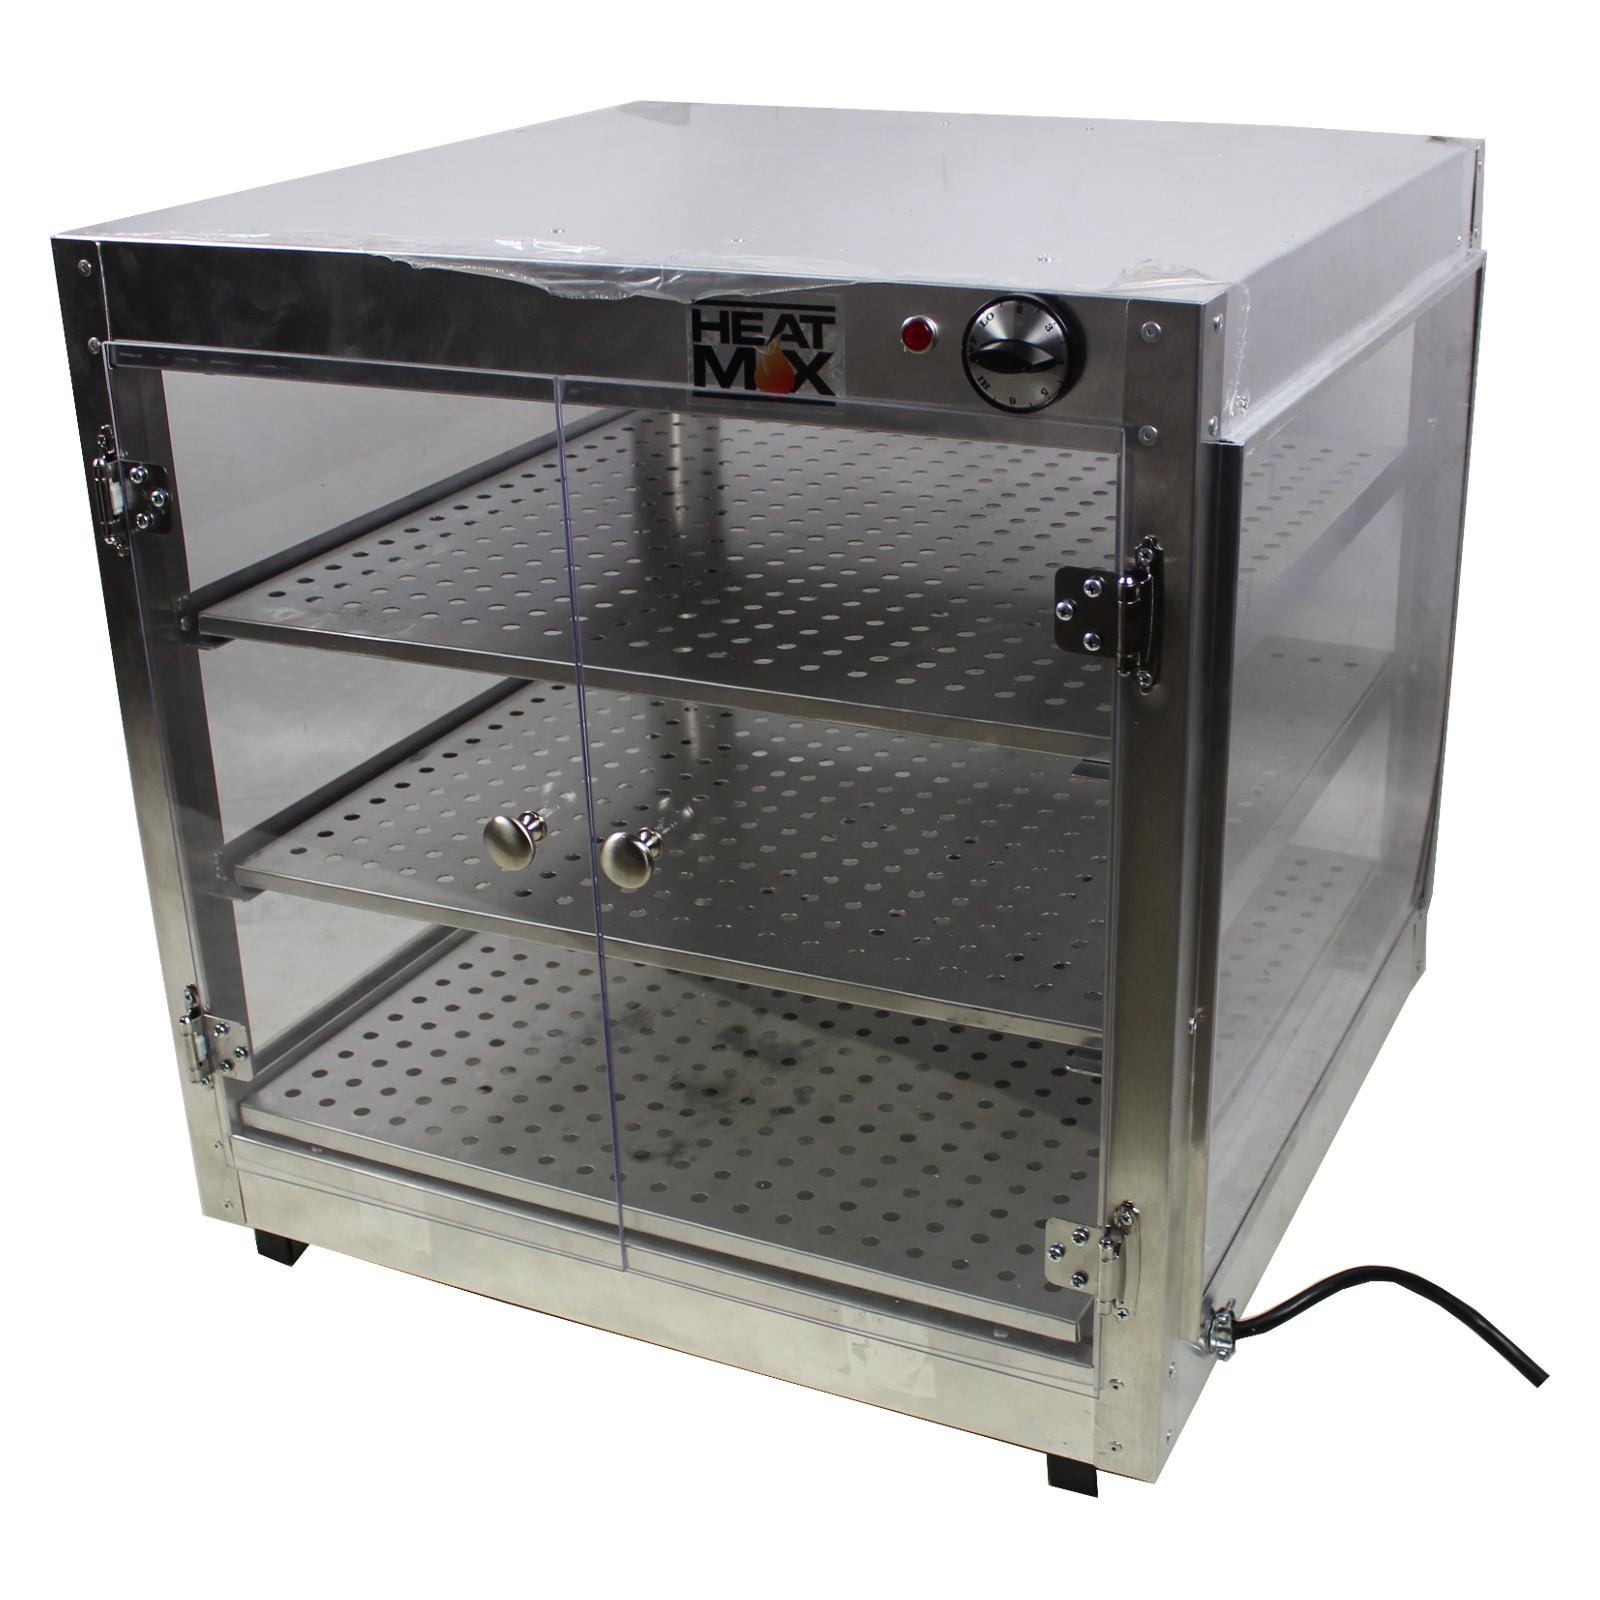 HeatMax Commercial 24 x 24 x 24 Countertop Food Pizza Pas...